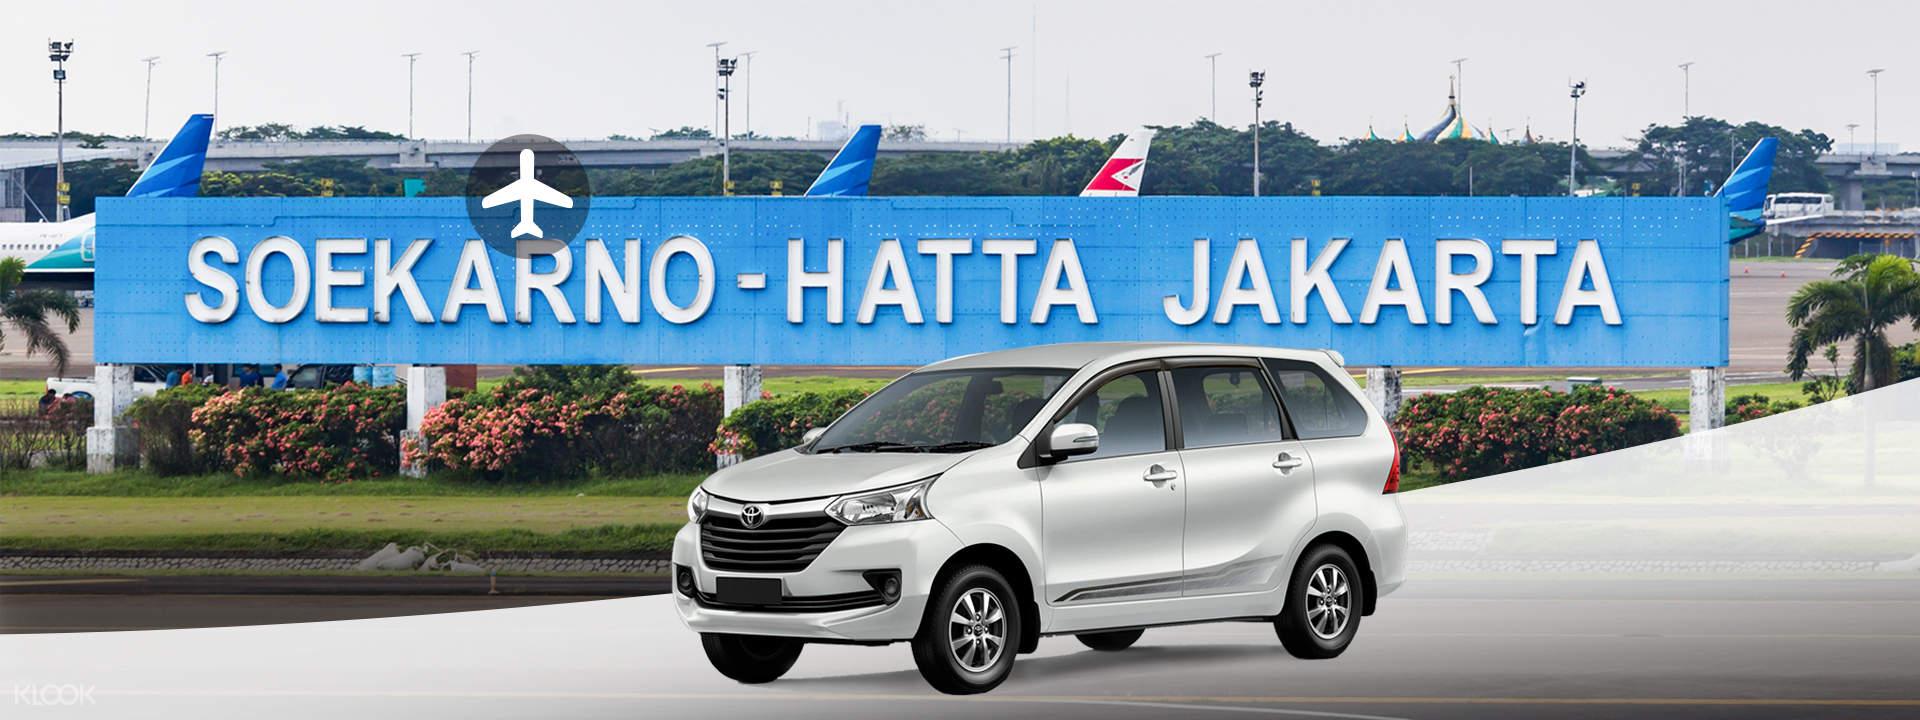 Private Soekarnohatta International Airport Cgk For Jakarta Klook New Kijang Innova 24 G A T Booking Fee Log In